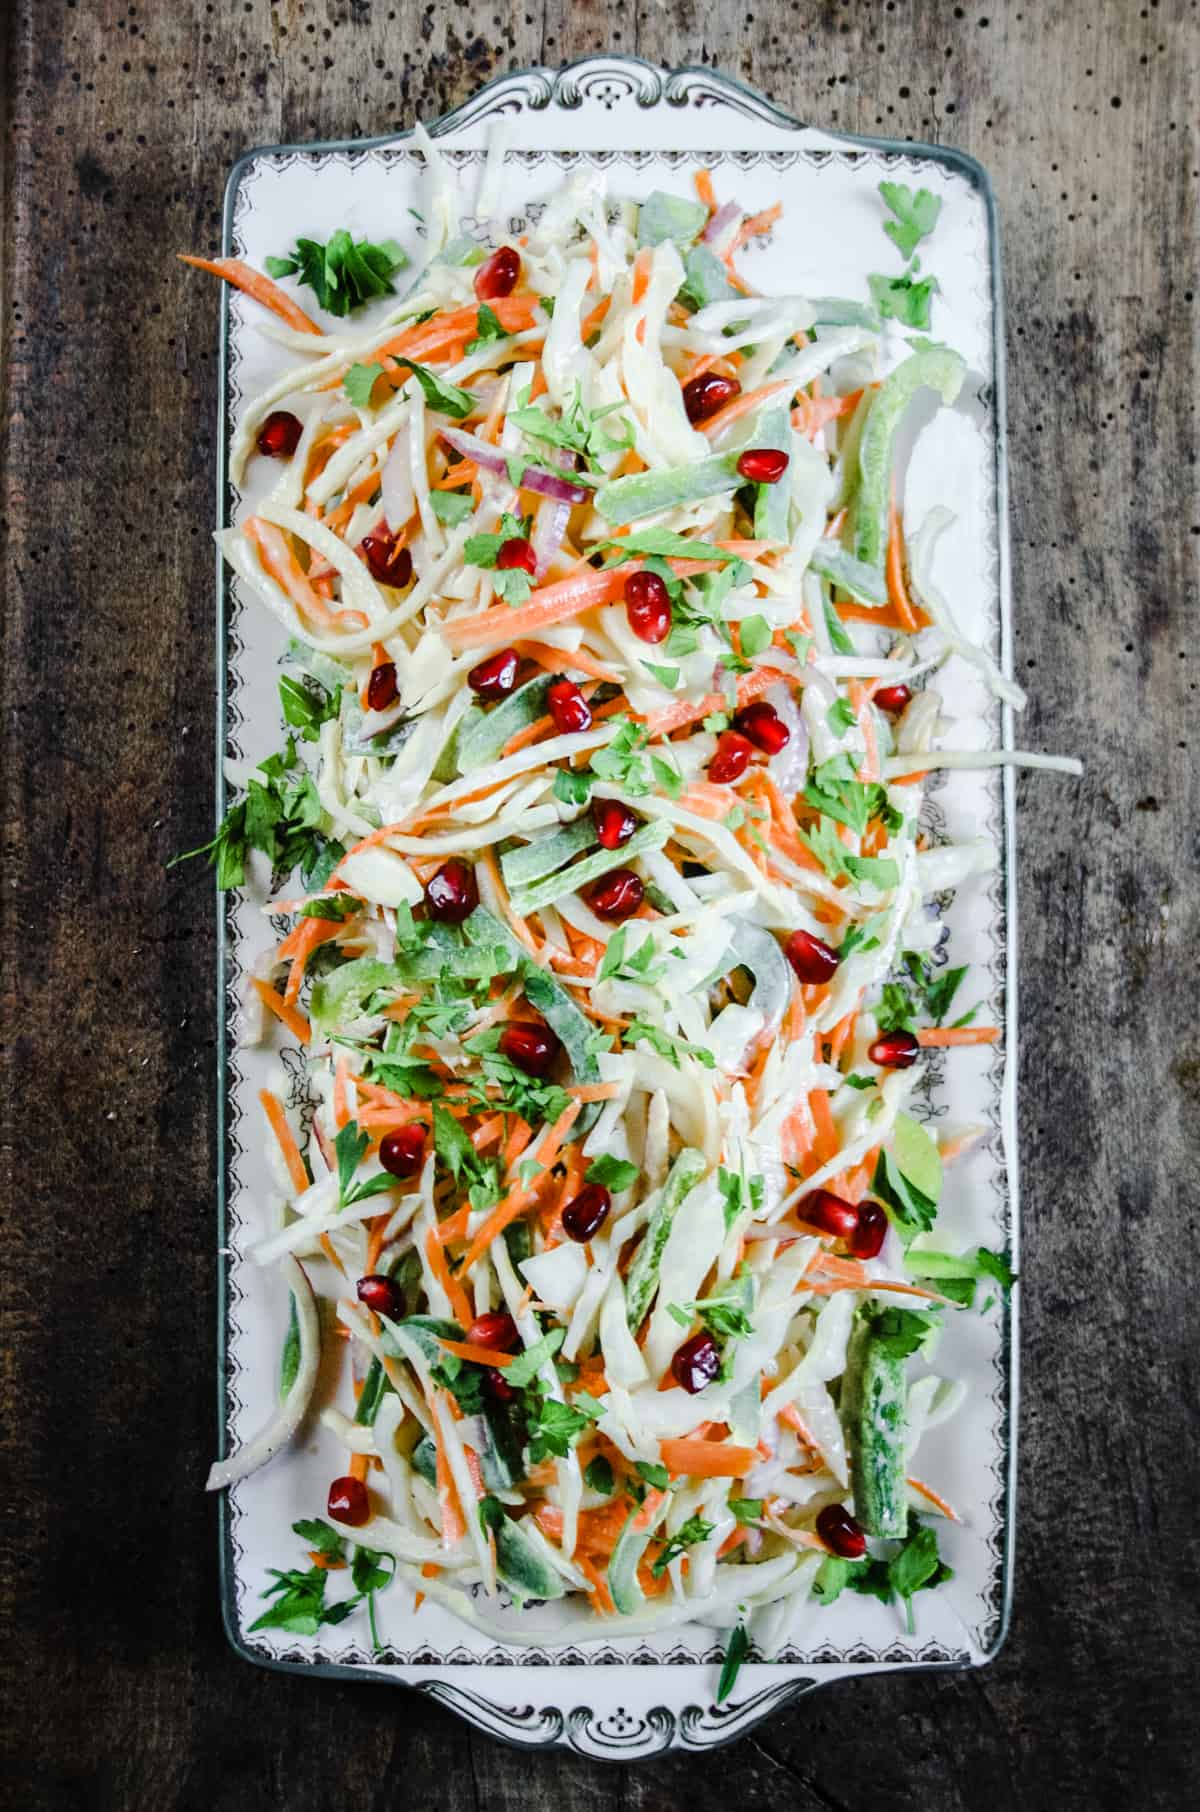 The Best Homemade Coleslaw